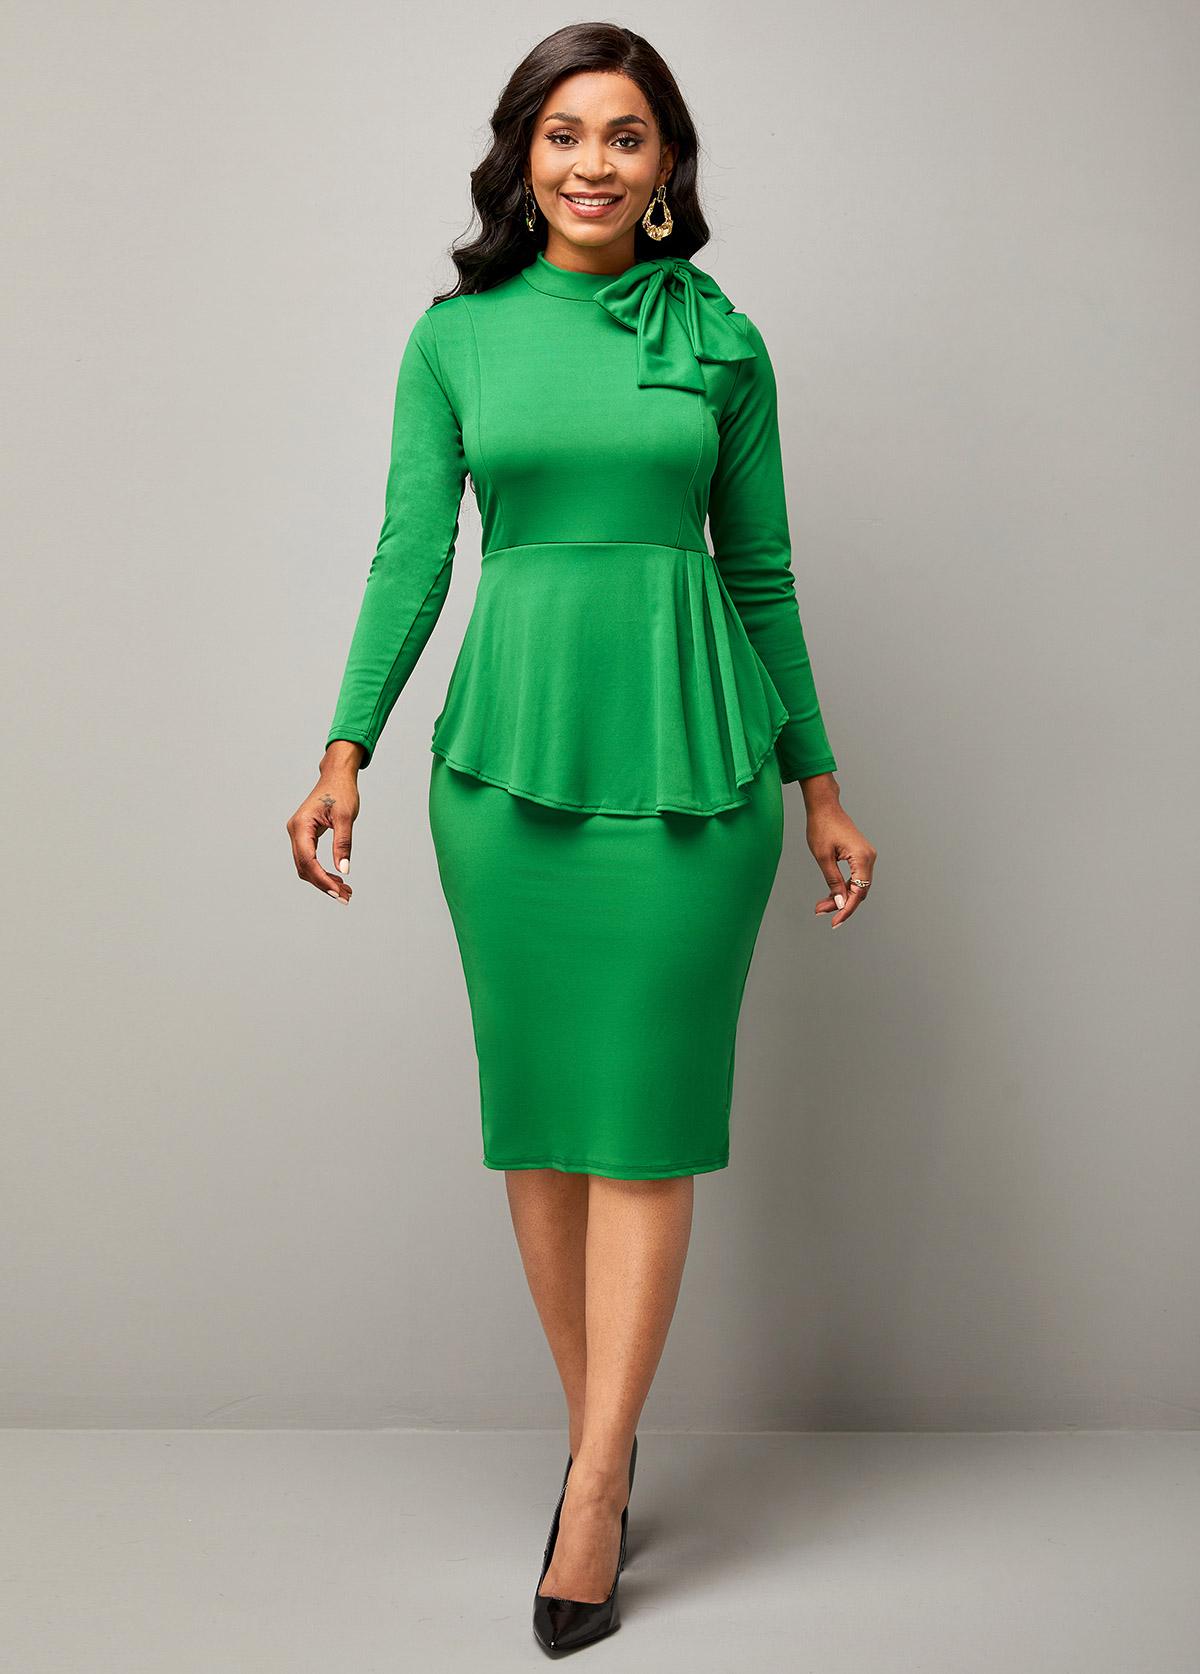 Bowknot Peplum Waist Mock Neck Bodycon Dress